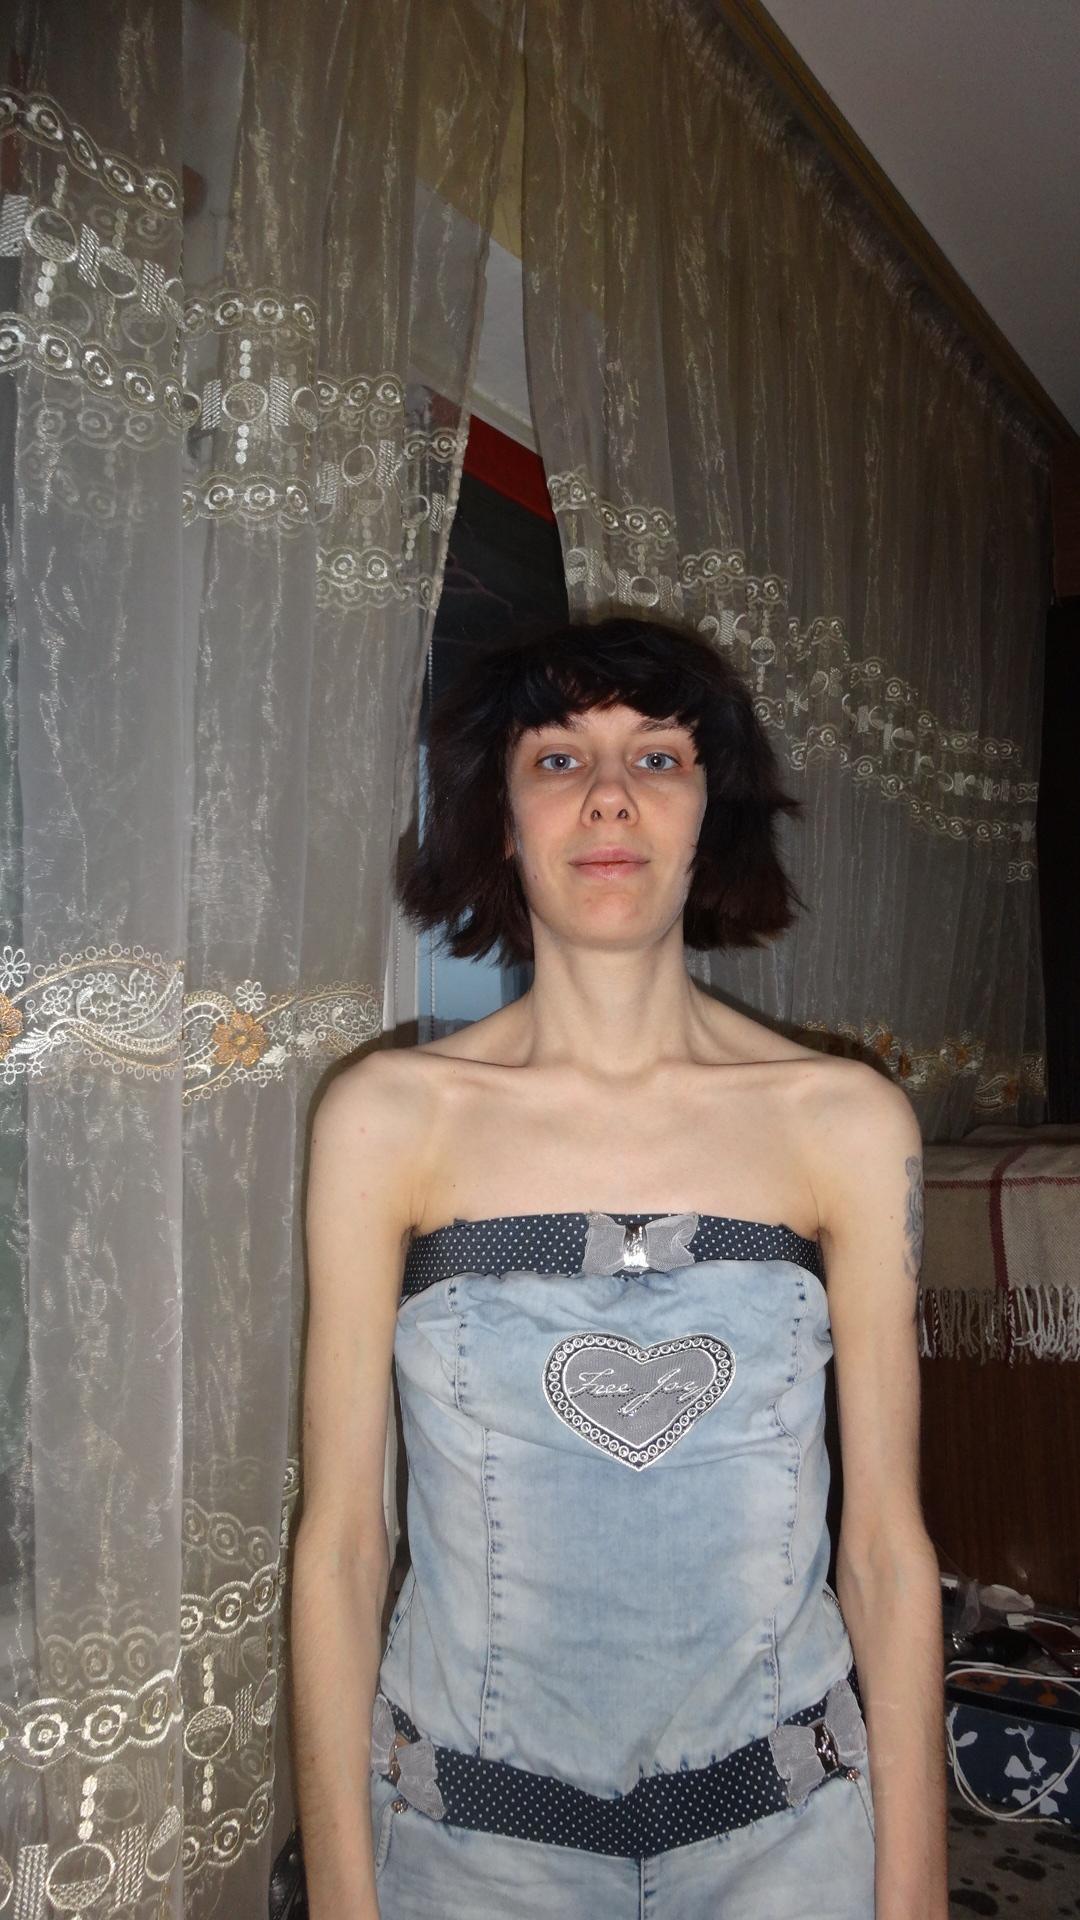 user1274, Евгения, 31, Королев